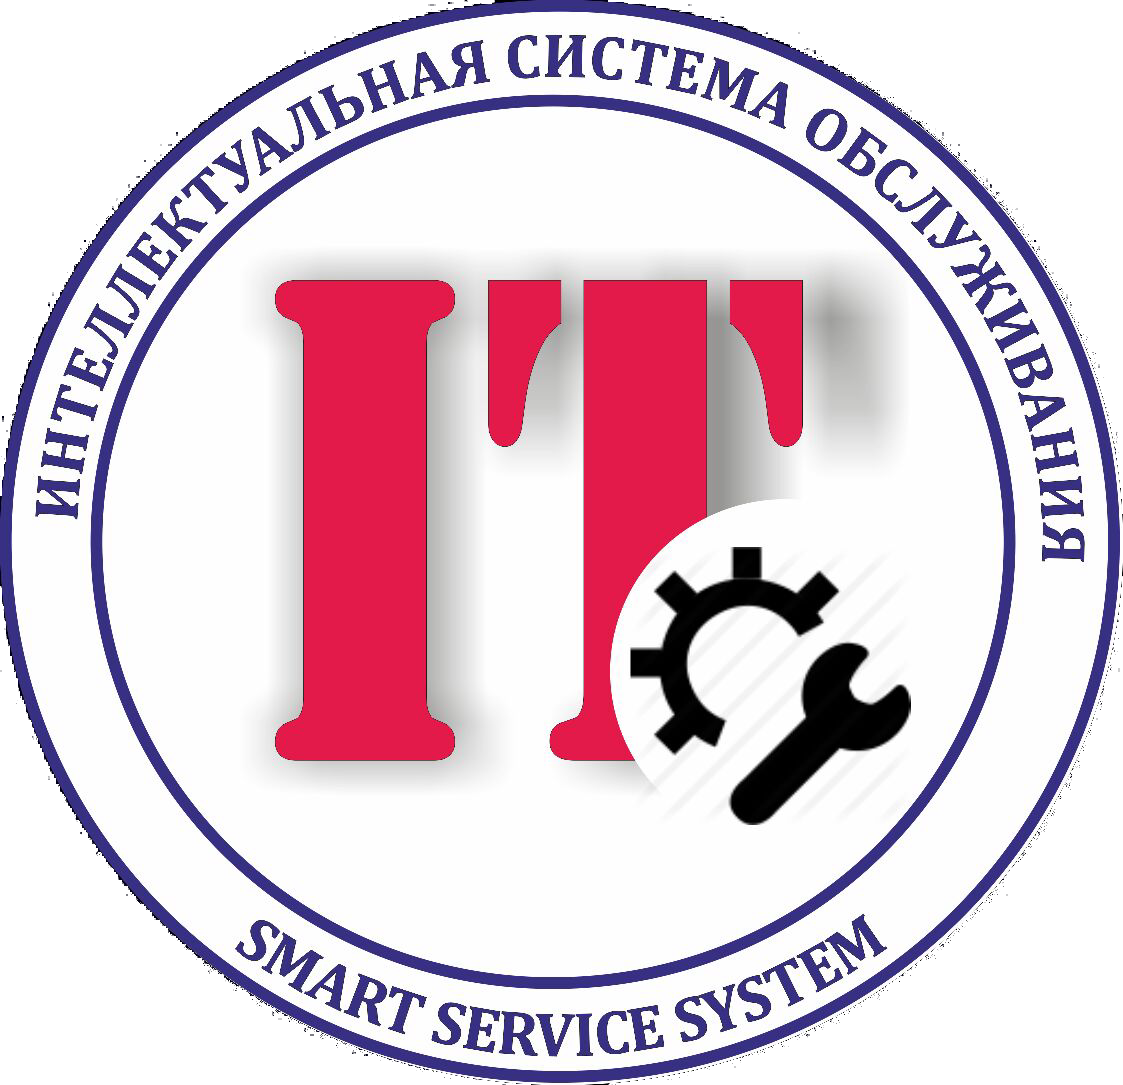 IT SMART SERVICE SYSTEM